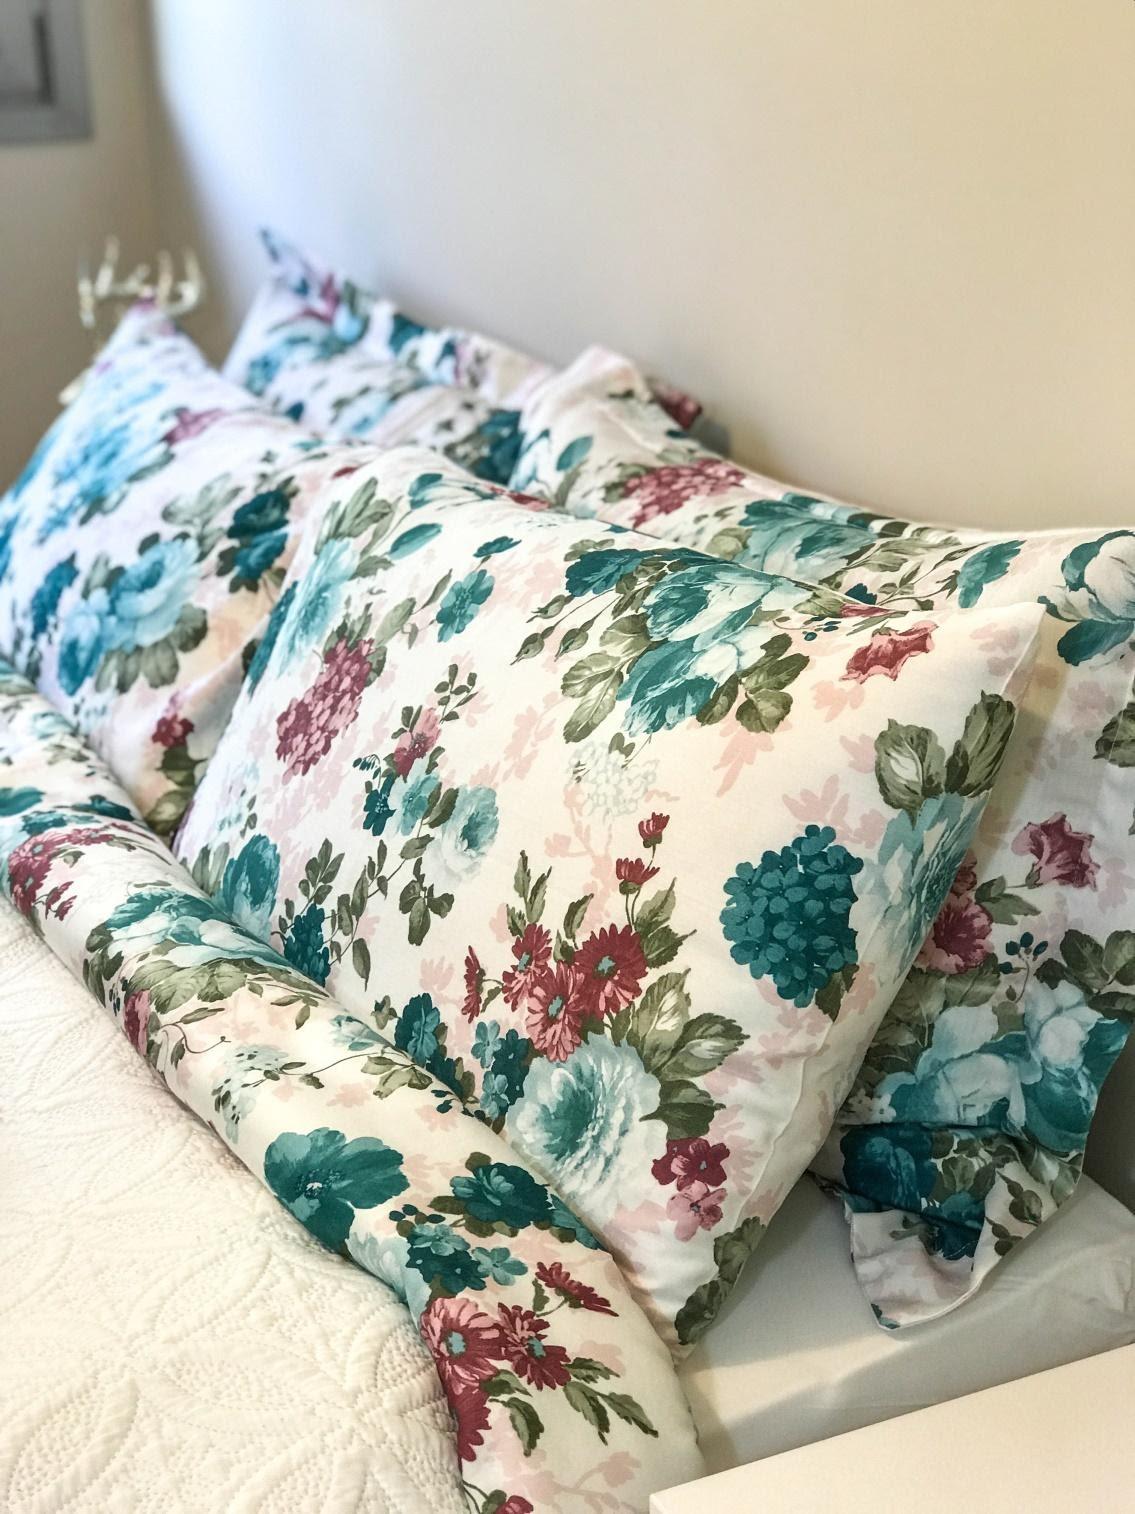 3. Stunning Bedding Duvet by simphome.com